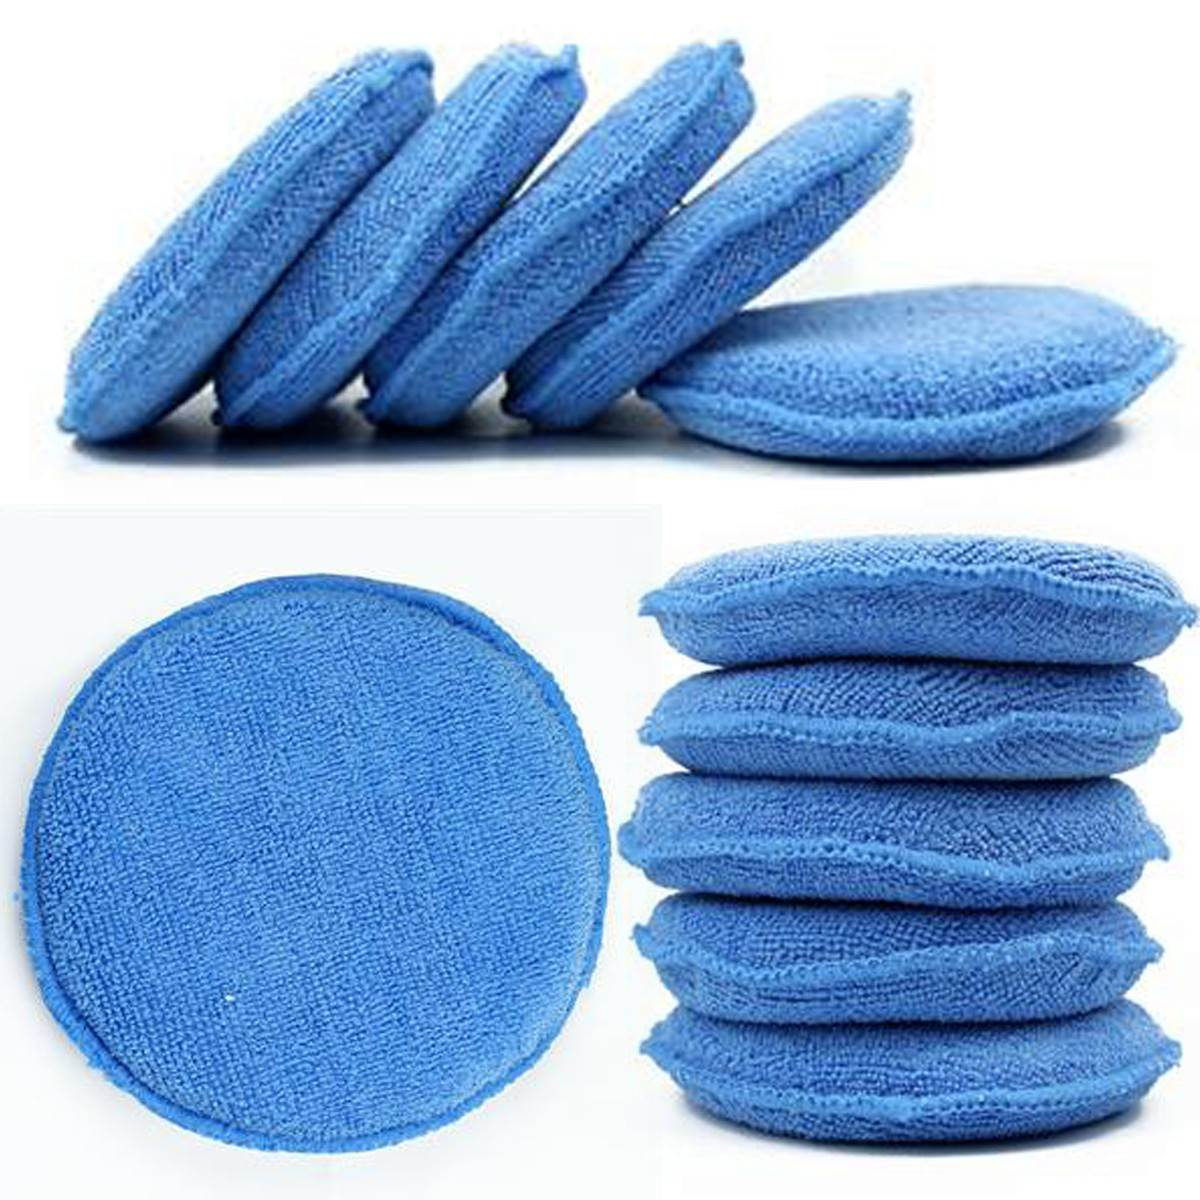 10pcs Waxing Polish Wax Foam Sponge Applicator Pads Cars Vehicle Glass Clean (Blue)